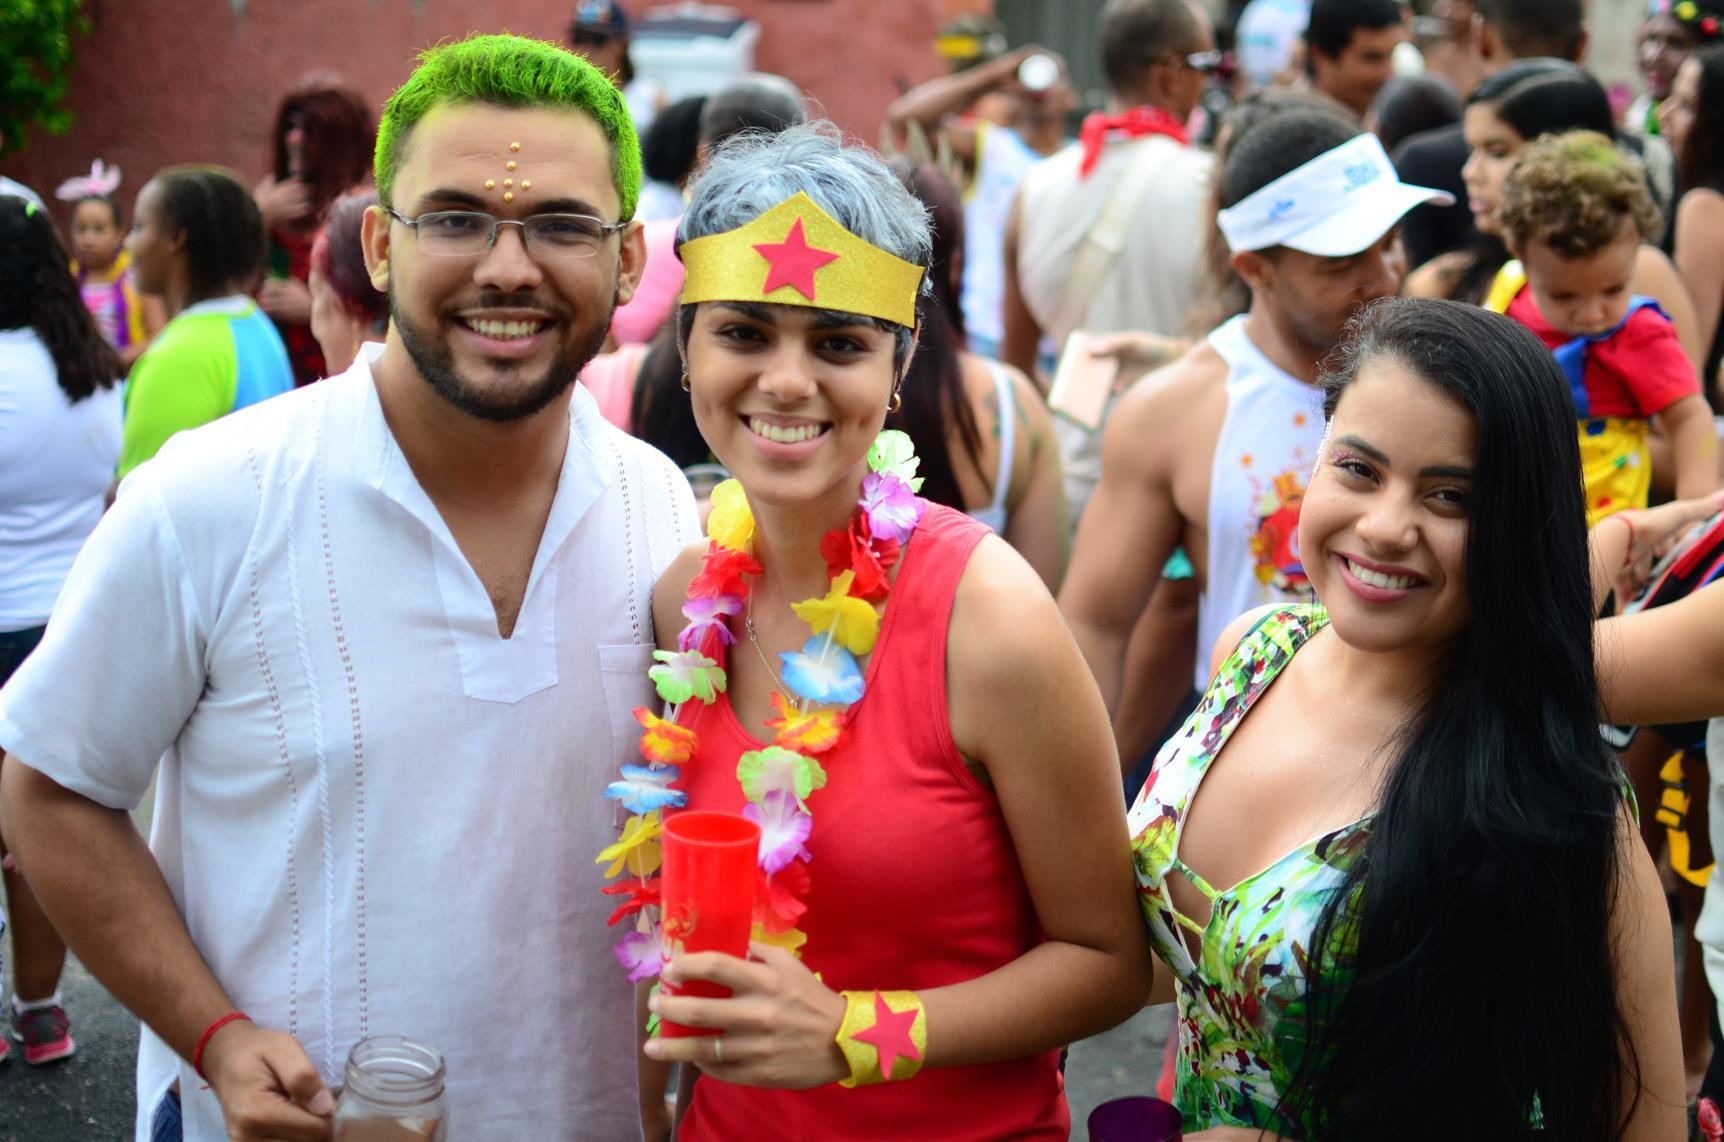 Cu pra lua - Carnaval Lagoa Santa 2018